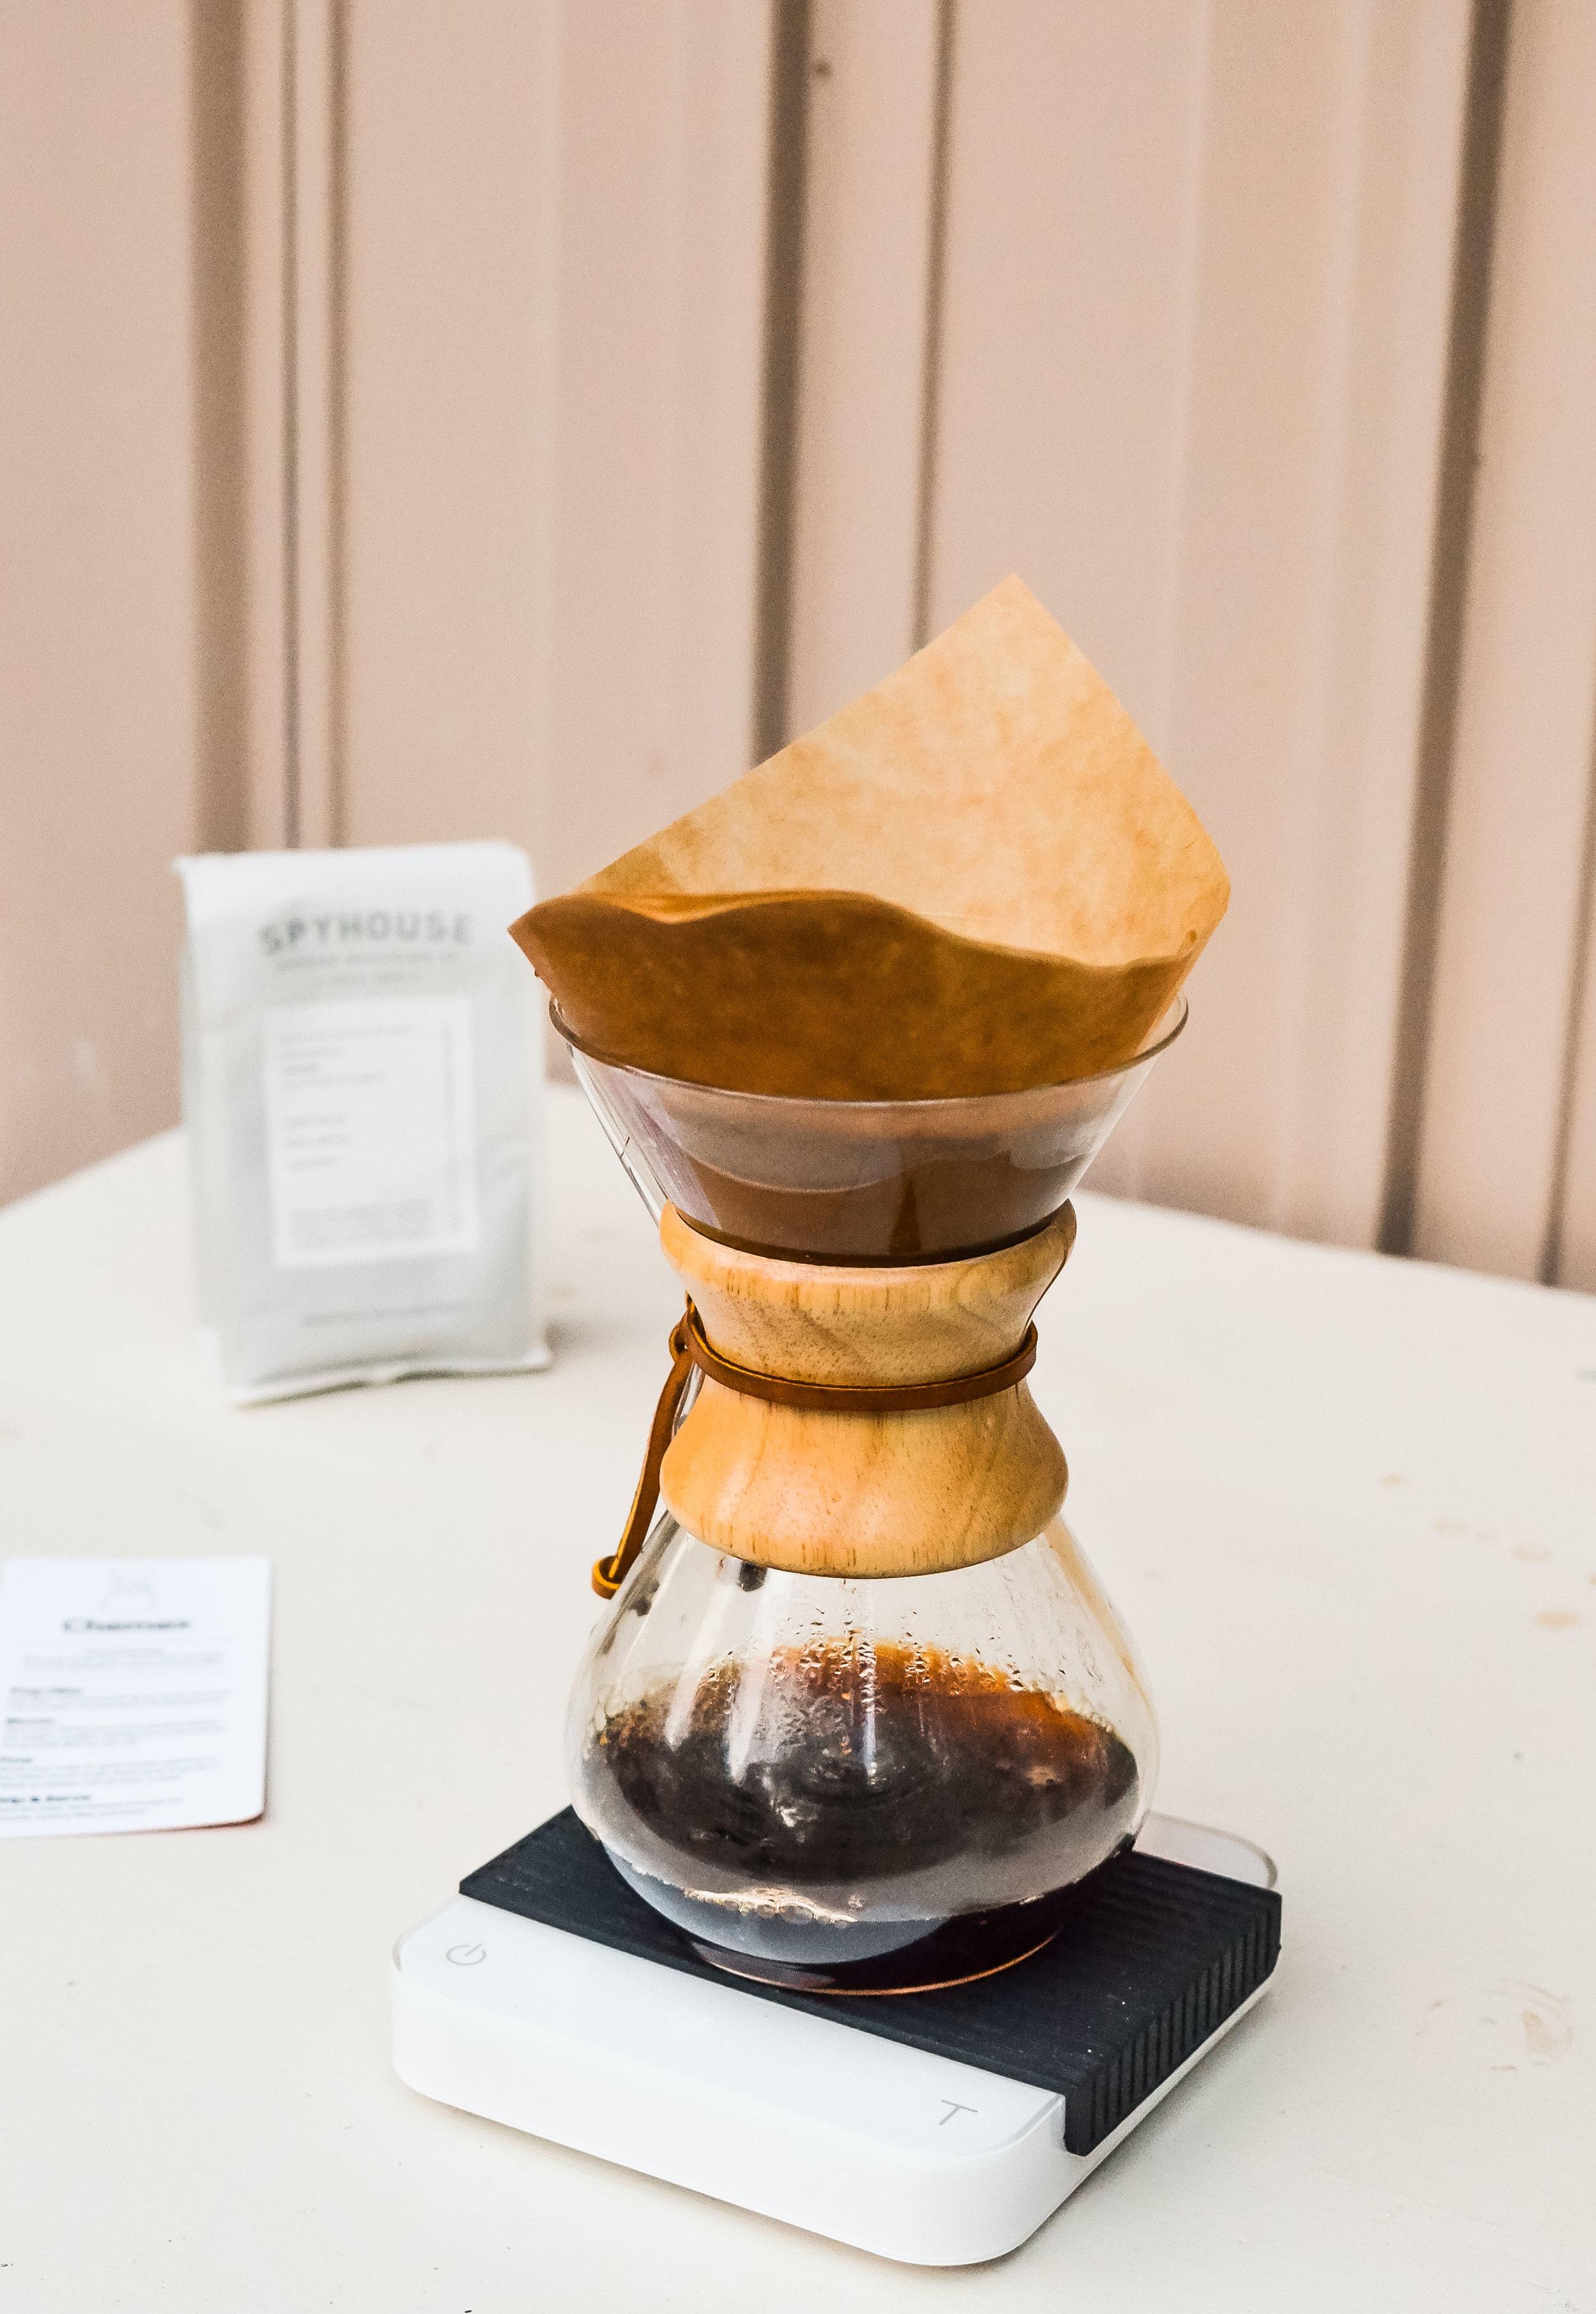 Wendling_Boyd_Trade_Coffee_Co_Spyhouse_Coffee-4.jpg